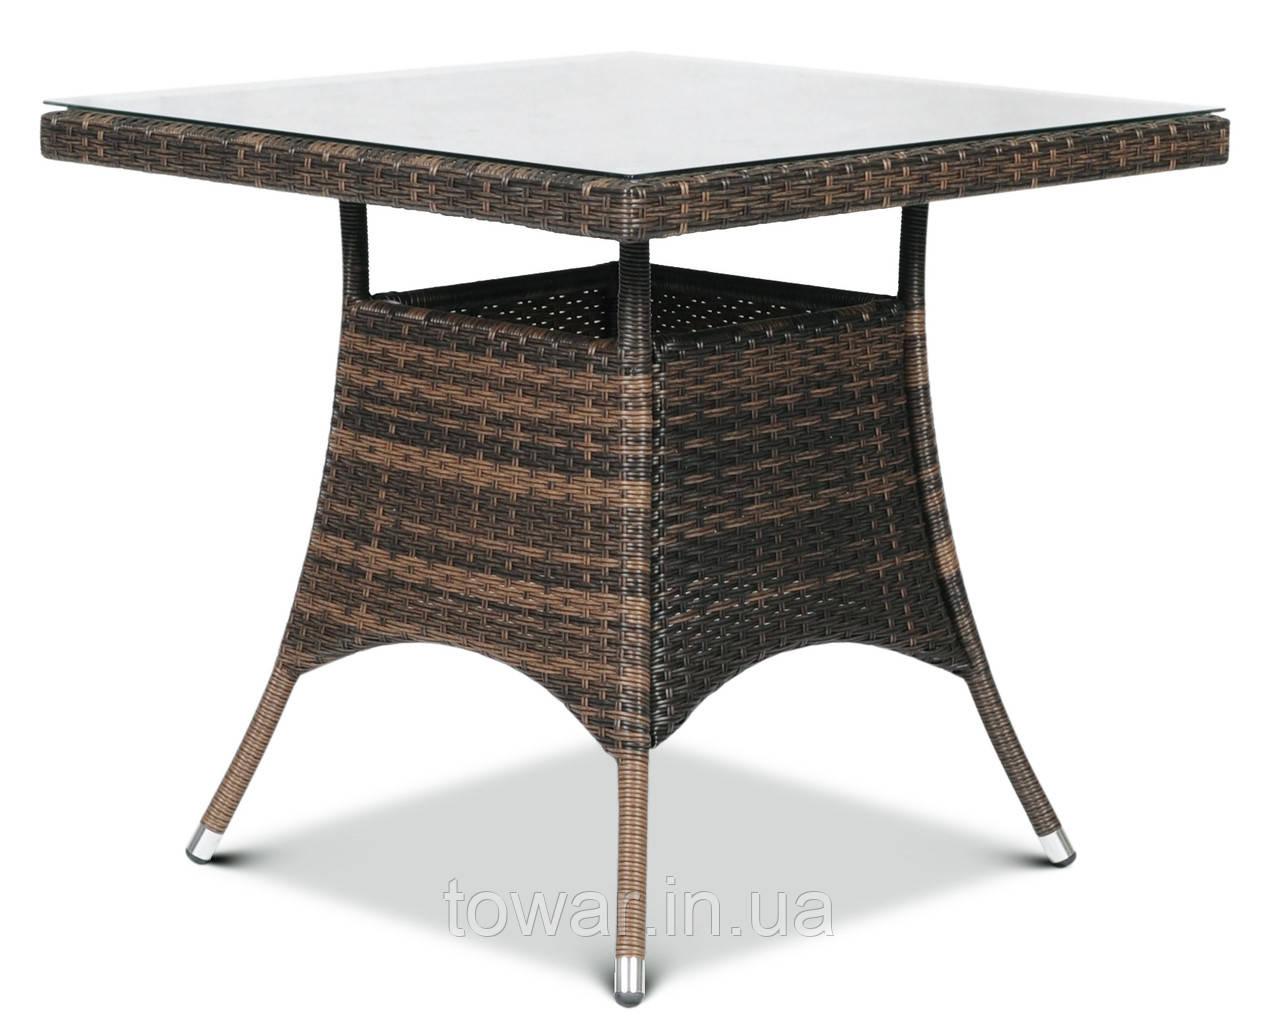 Садовый стол LUGO technorattan 80x80 для террасы